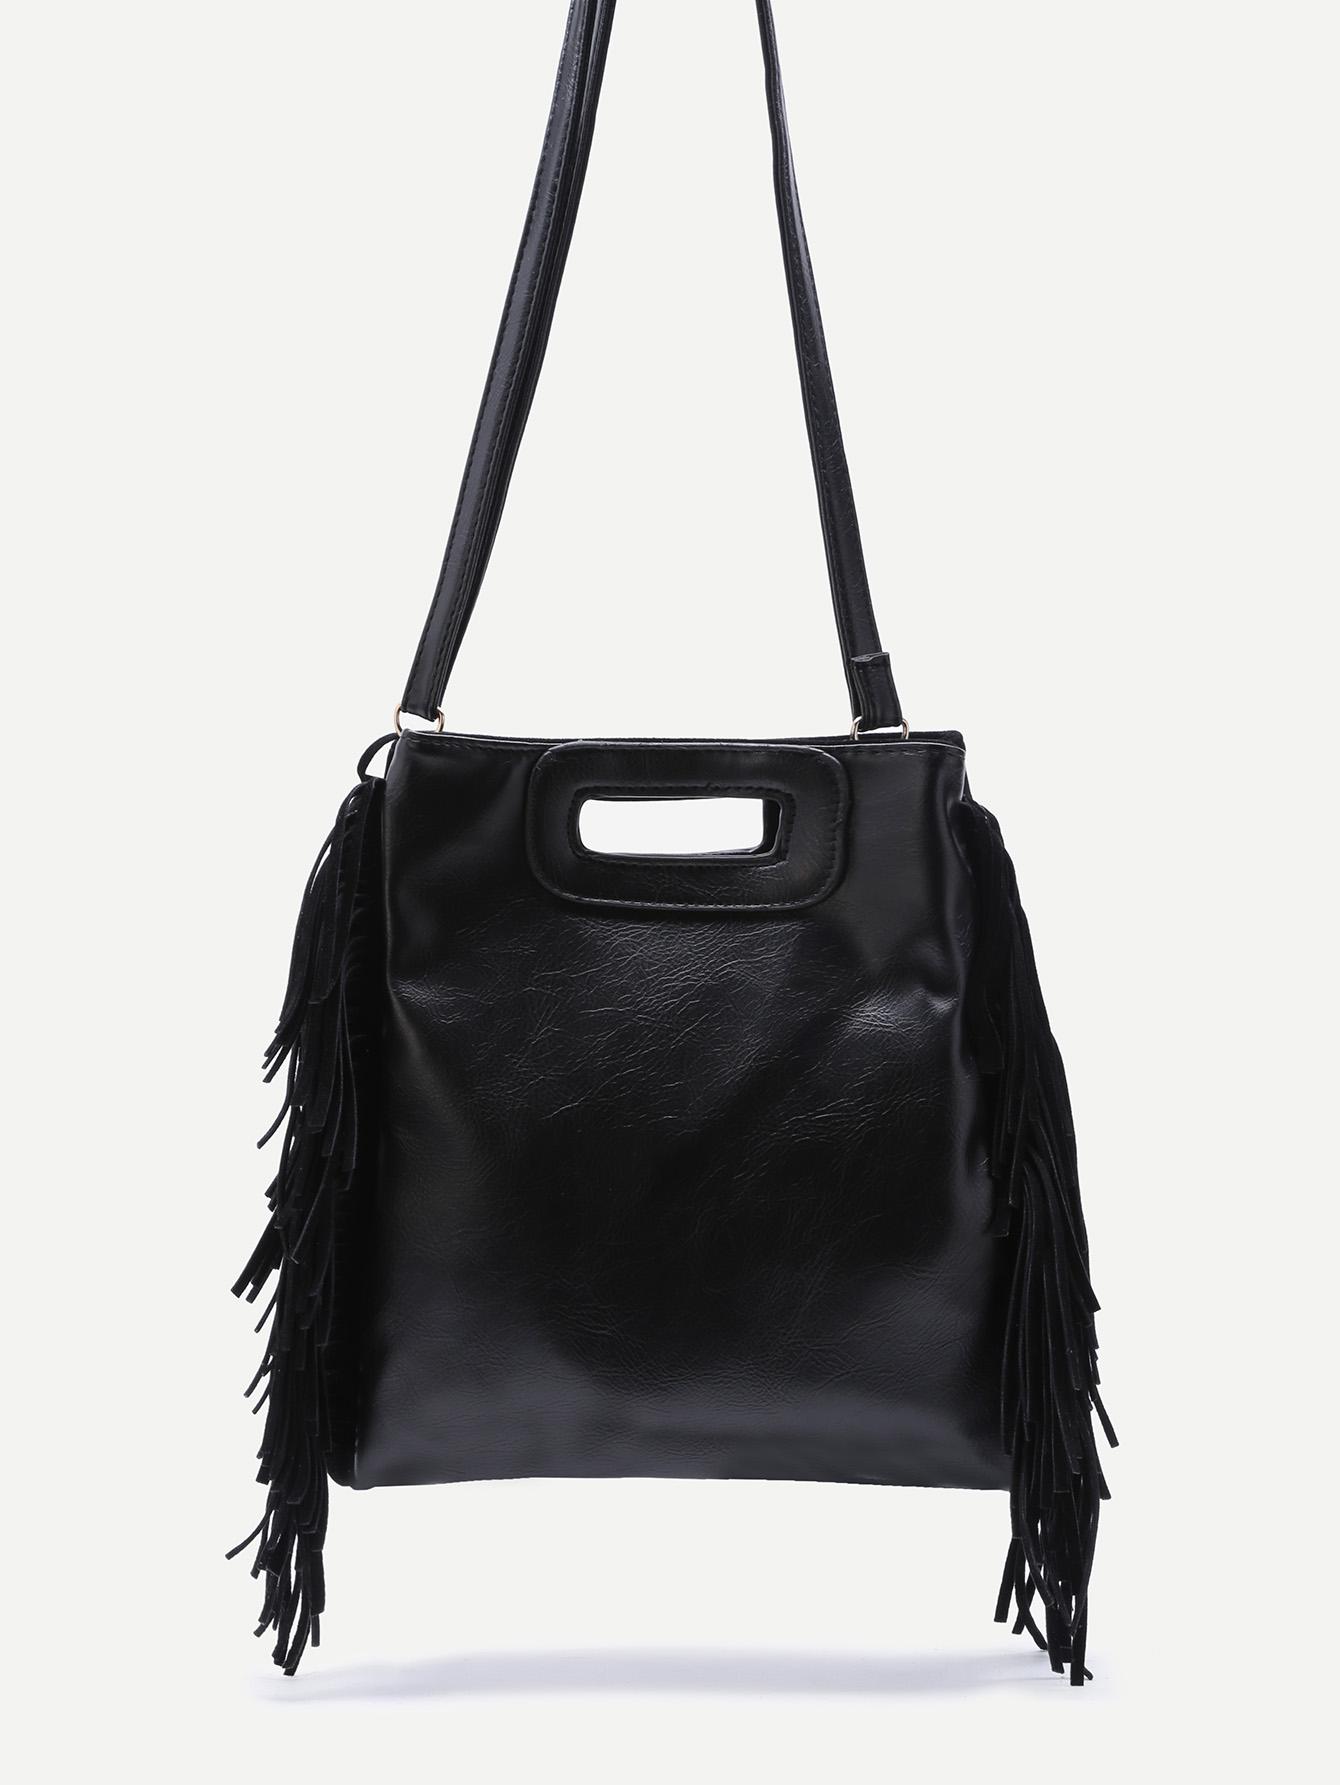 bag161019919_2